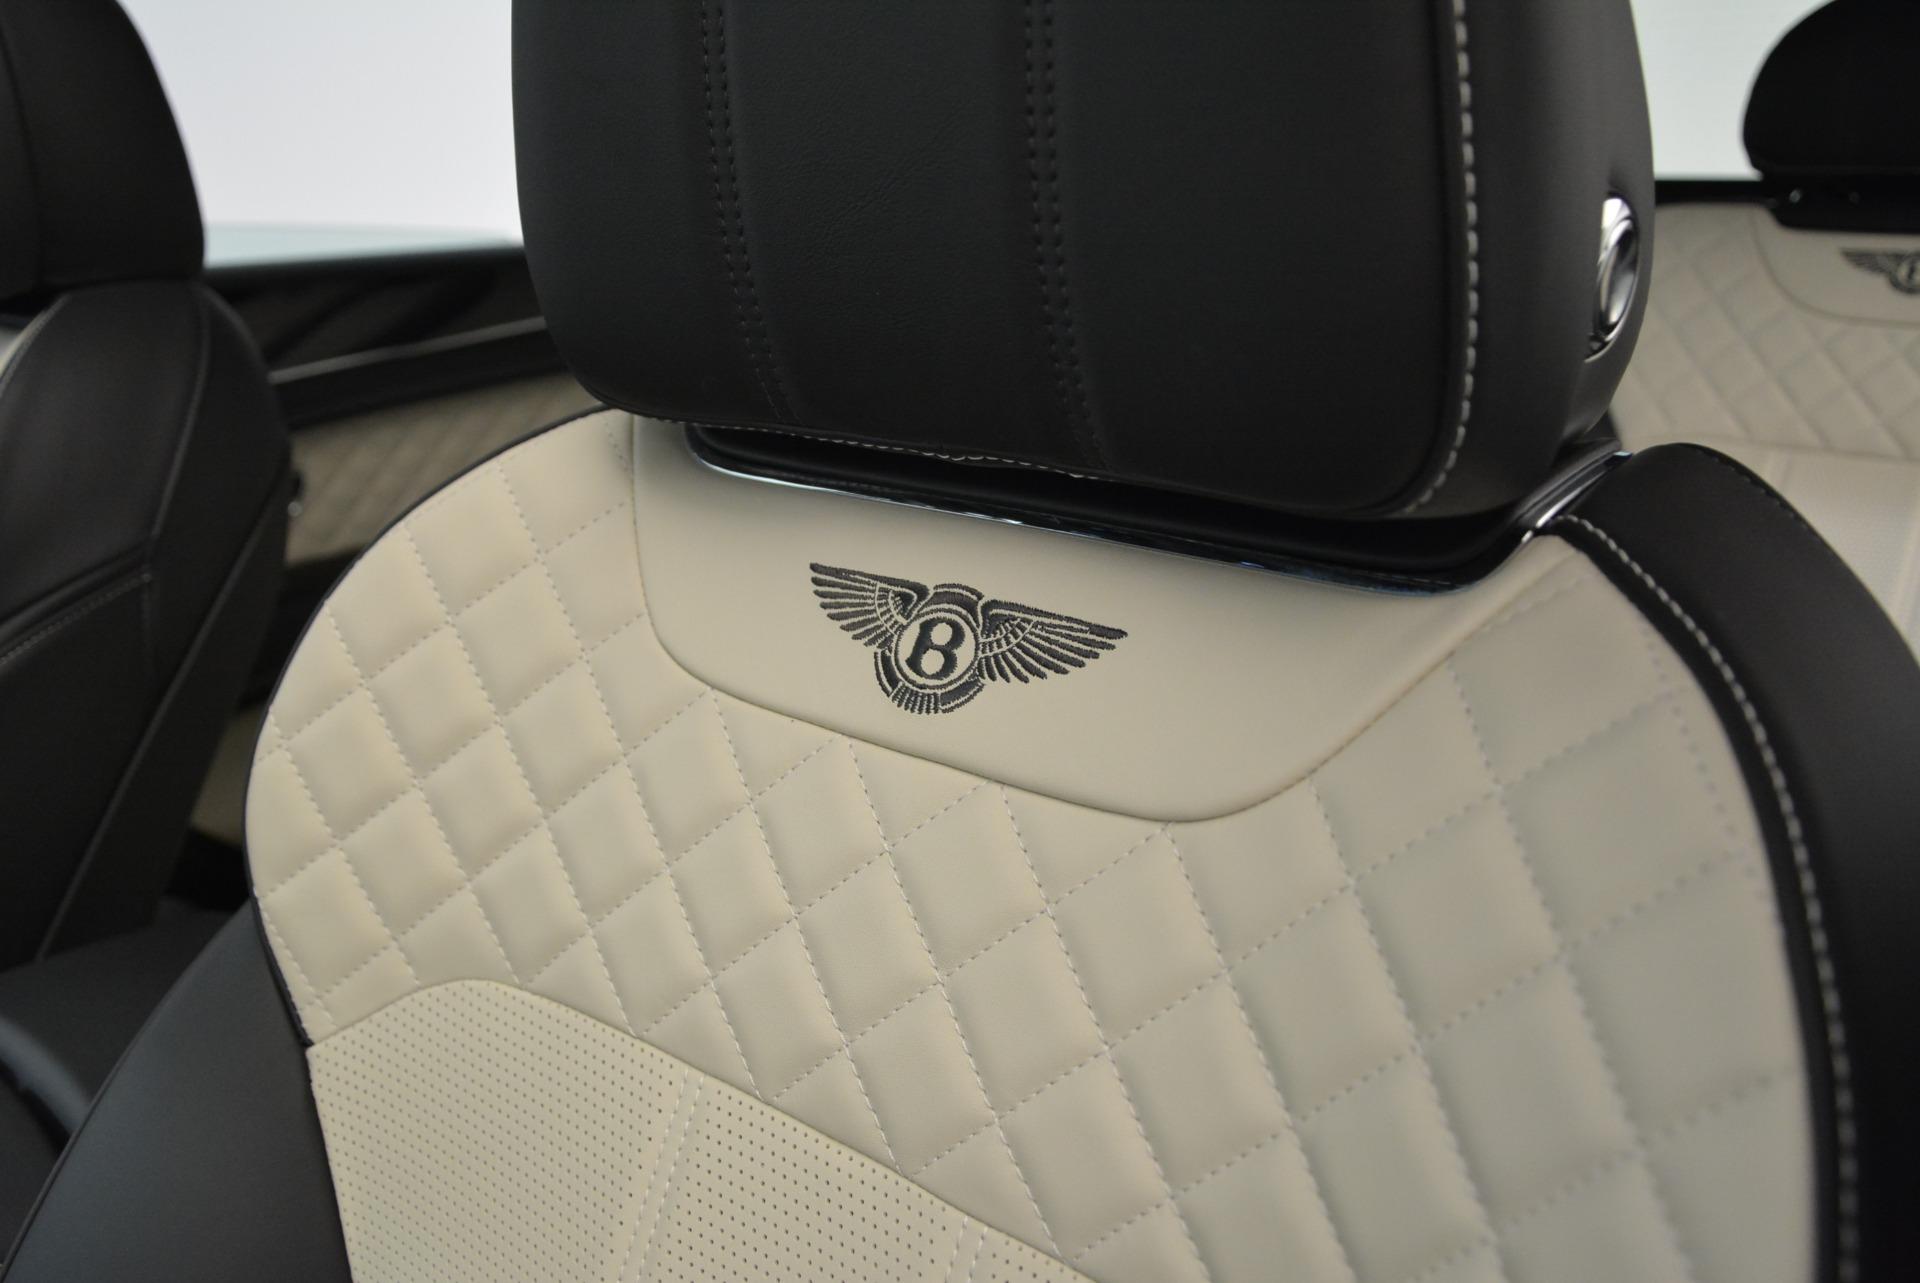 Used 2018 Bentley Bentayga Activity Edition For Sale In Westport, CT 1922_p20